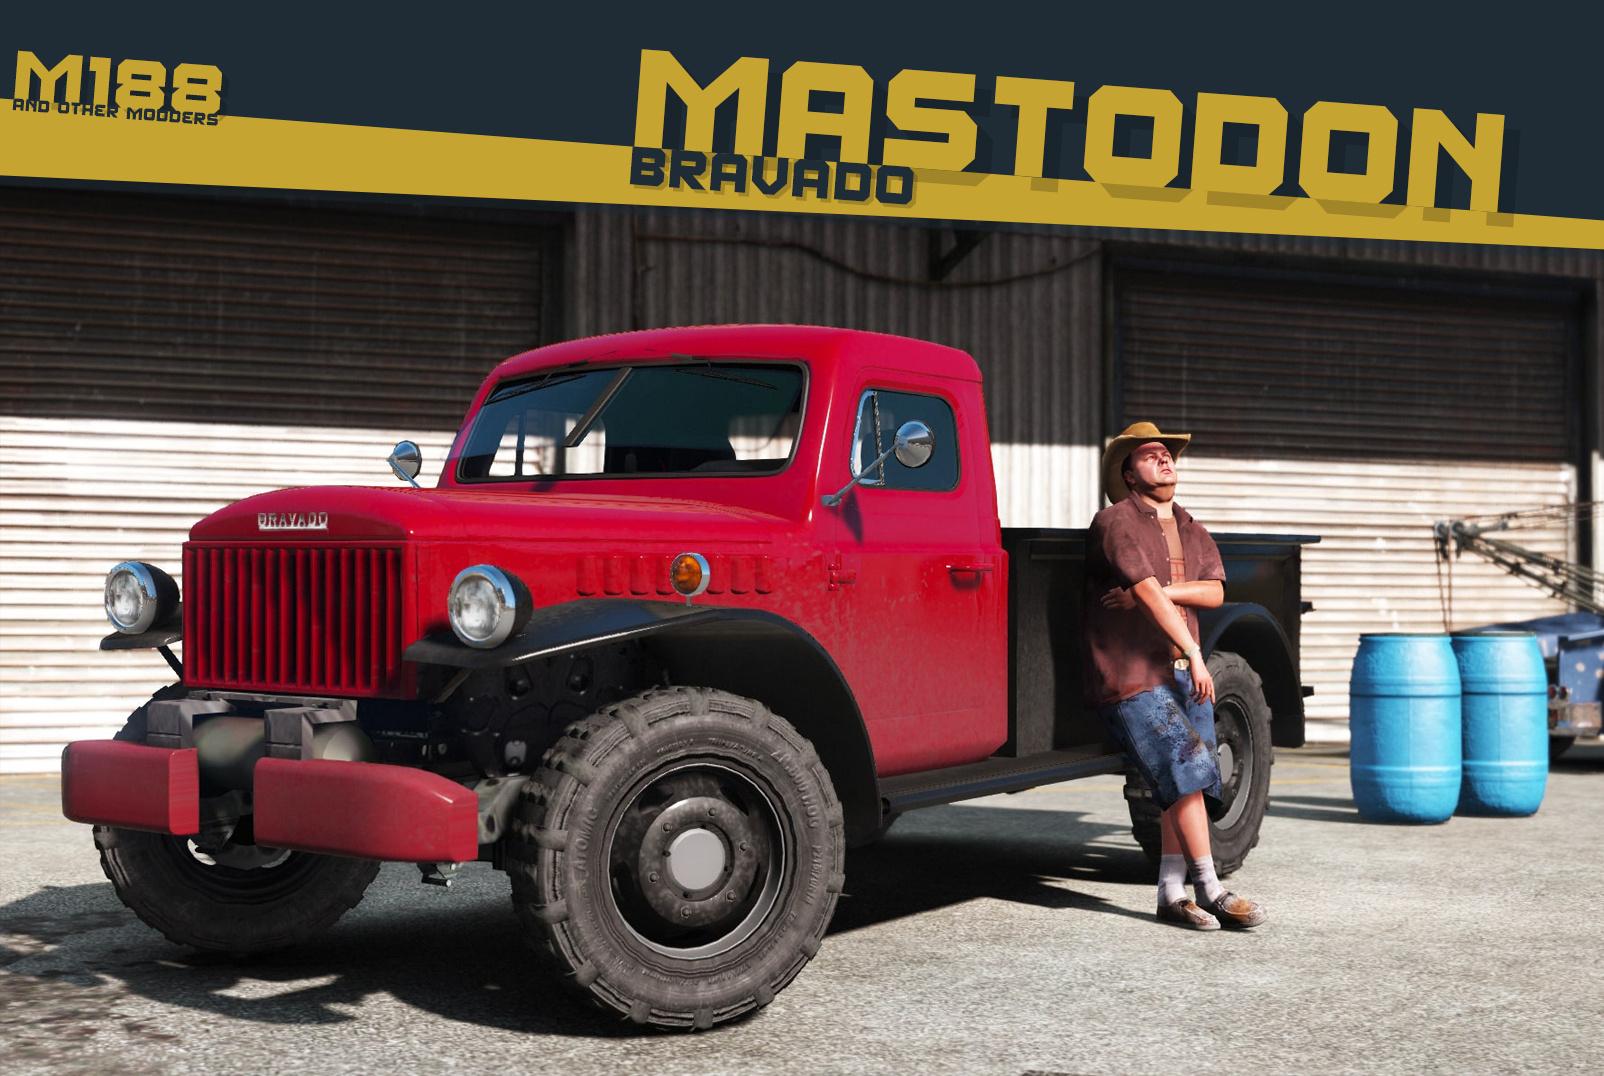 d7ae02-Mastodon.jpg